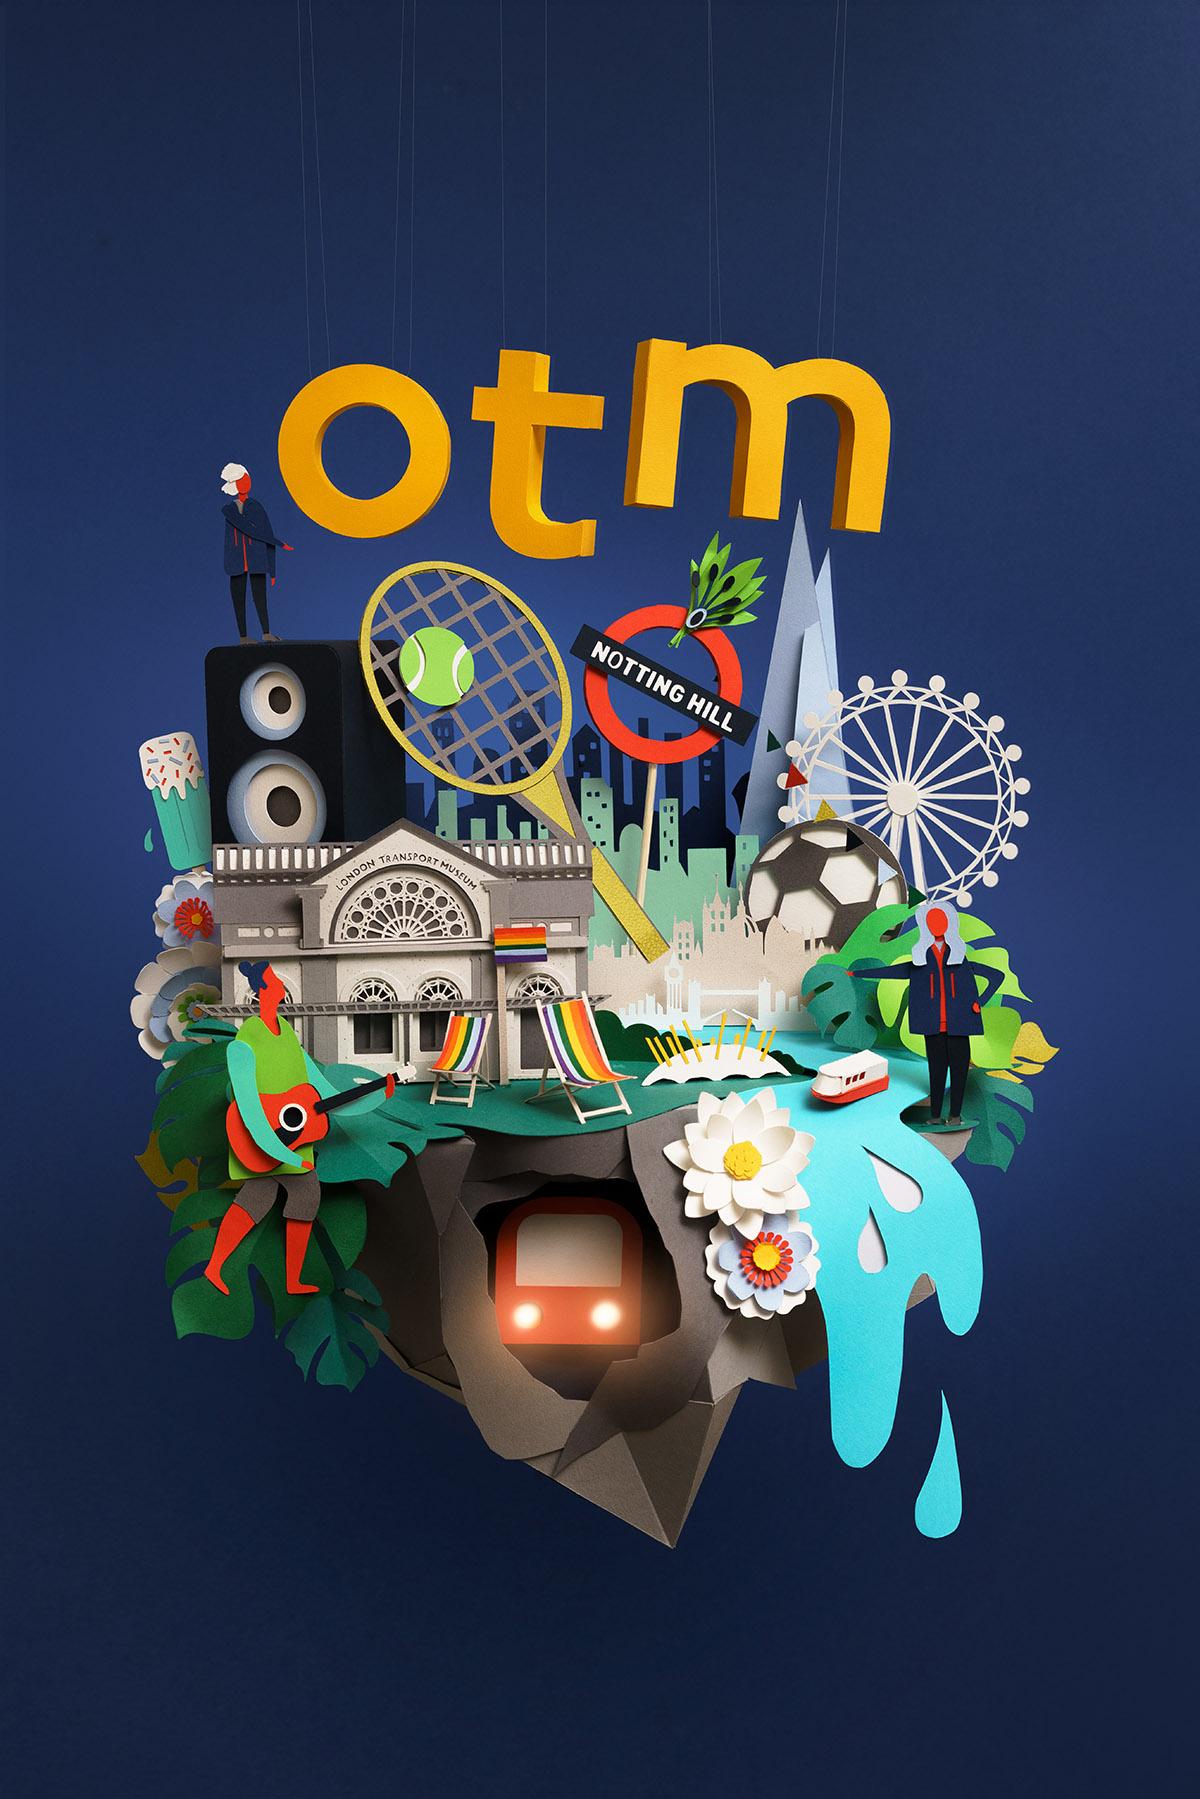 OTM_Main Transport_for_London_Sam_Pierpoint